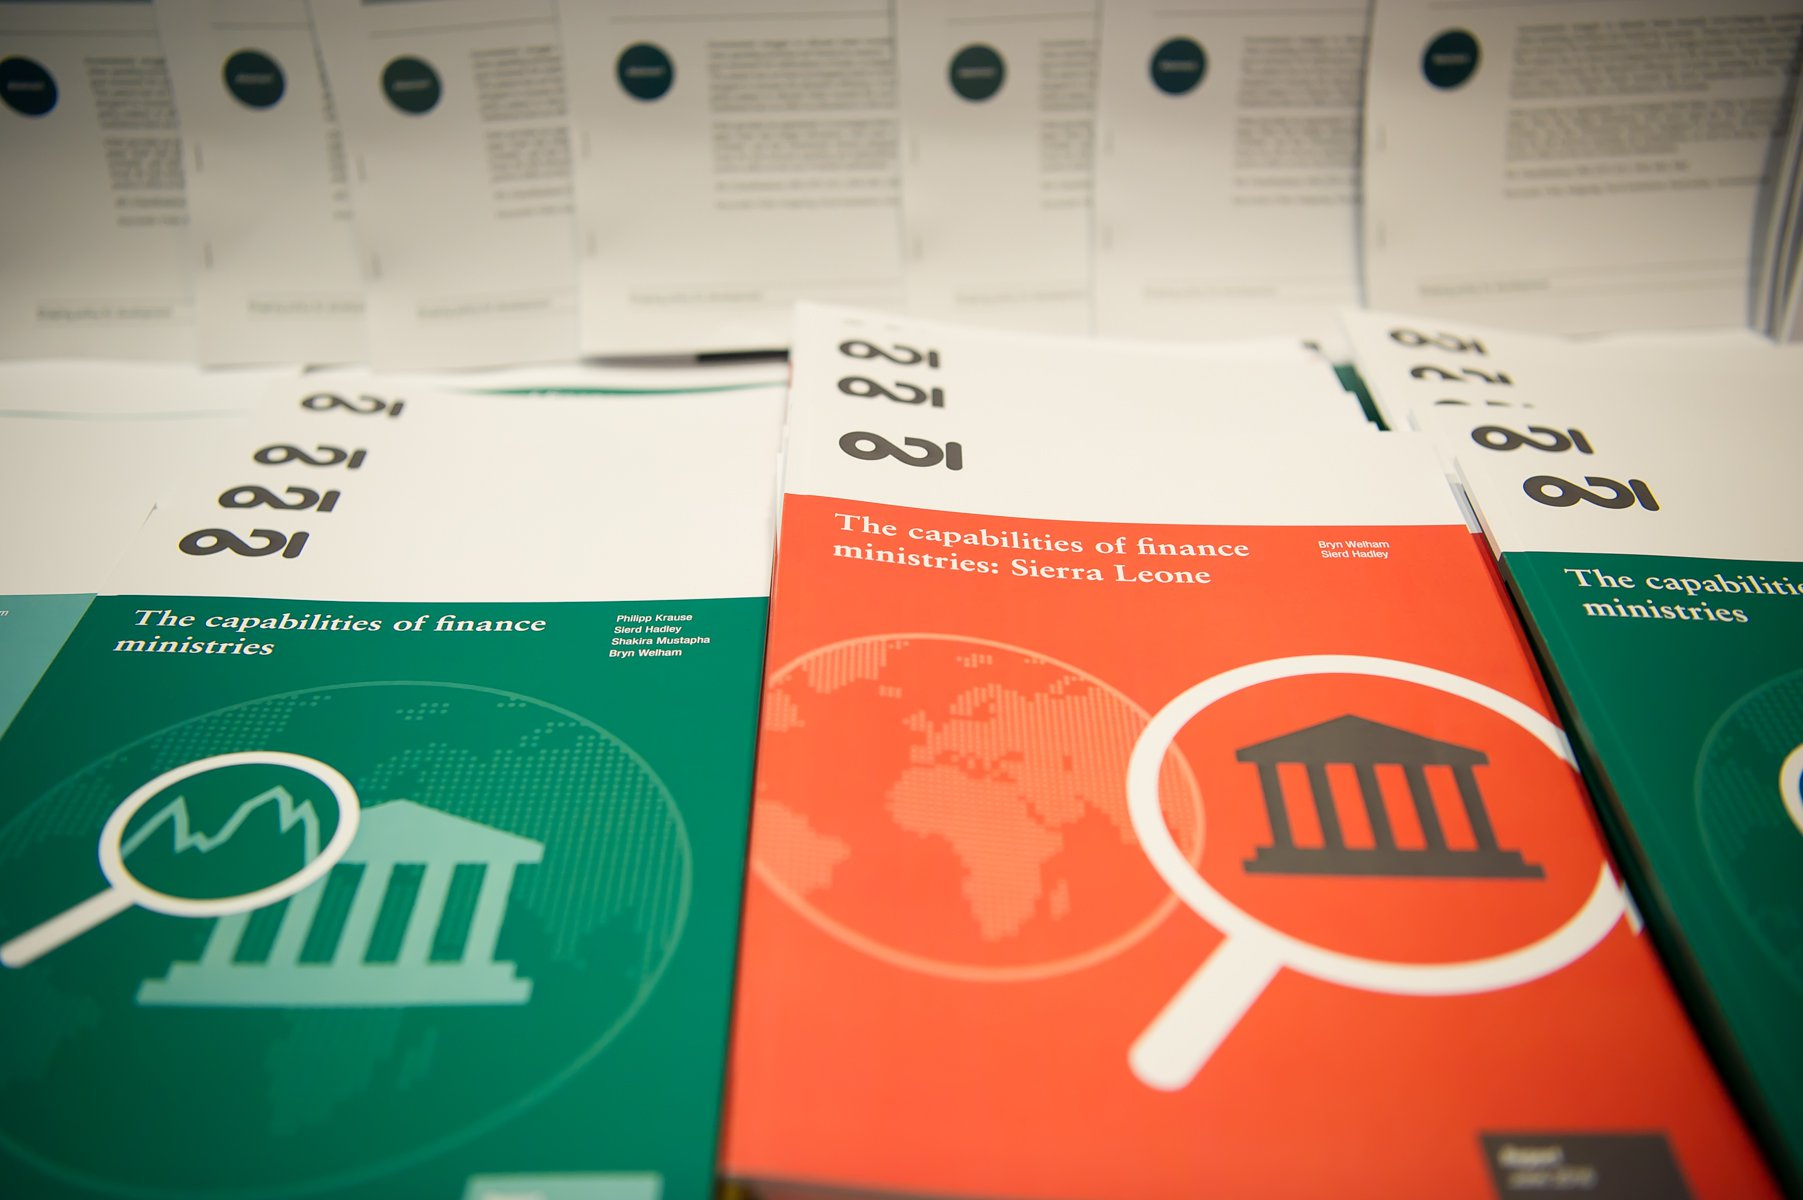 Capabilities of Finance Ministries event publications. Photo: Patrick Bora